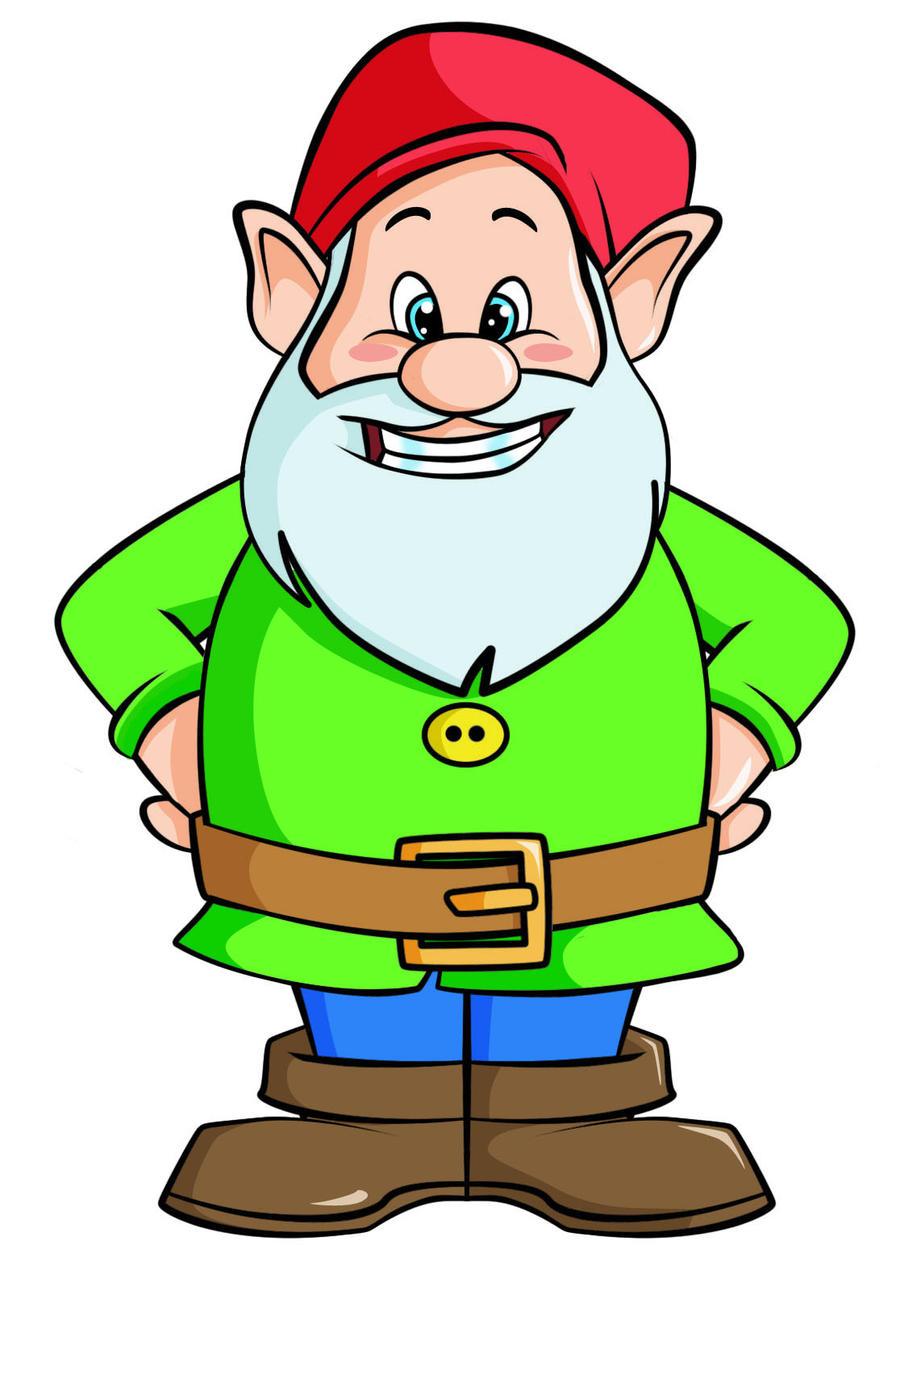 Gnome Clip Art: Gnome Cartoon By Shoofy29 On DeviantArt